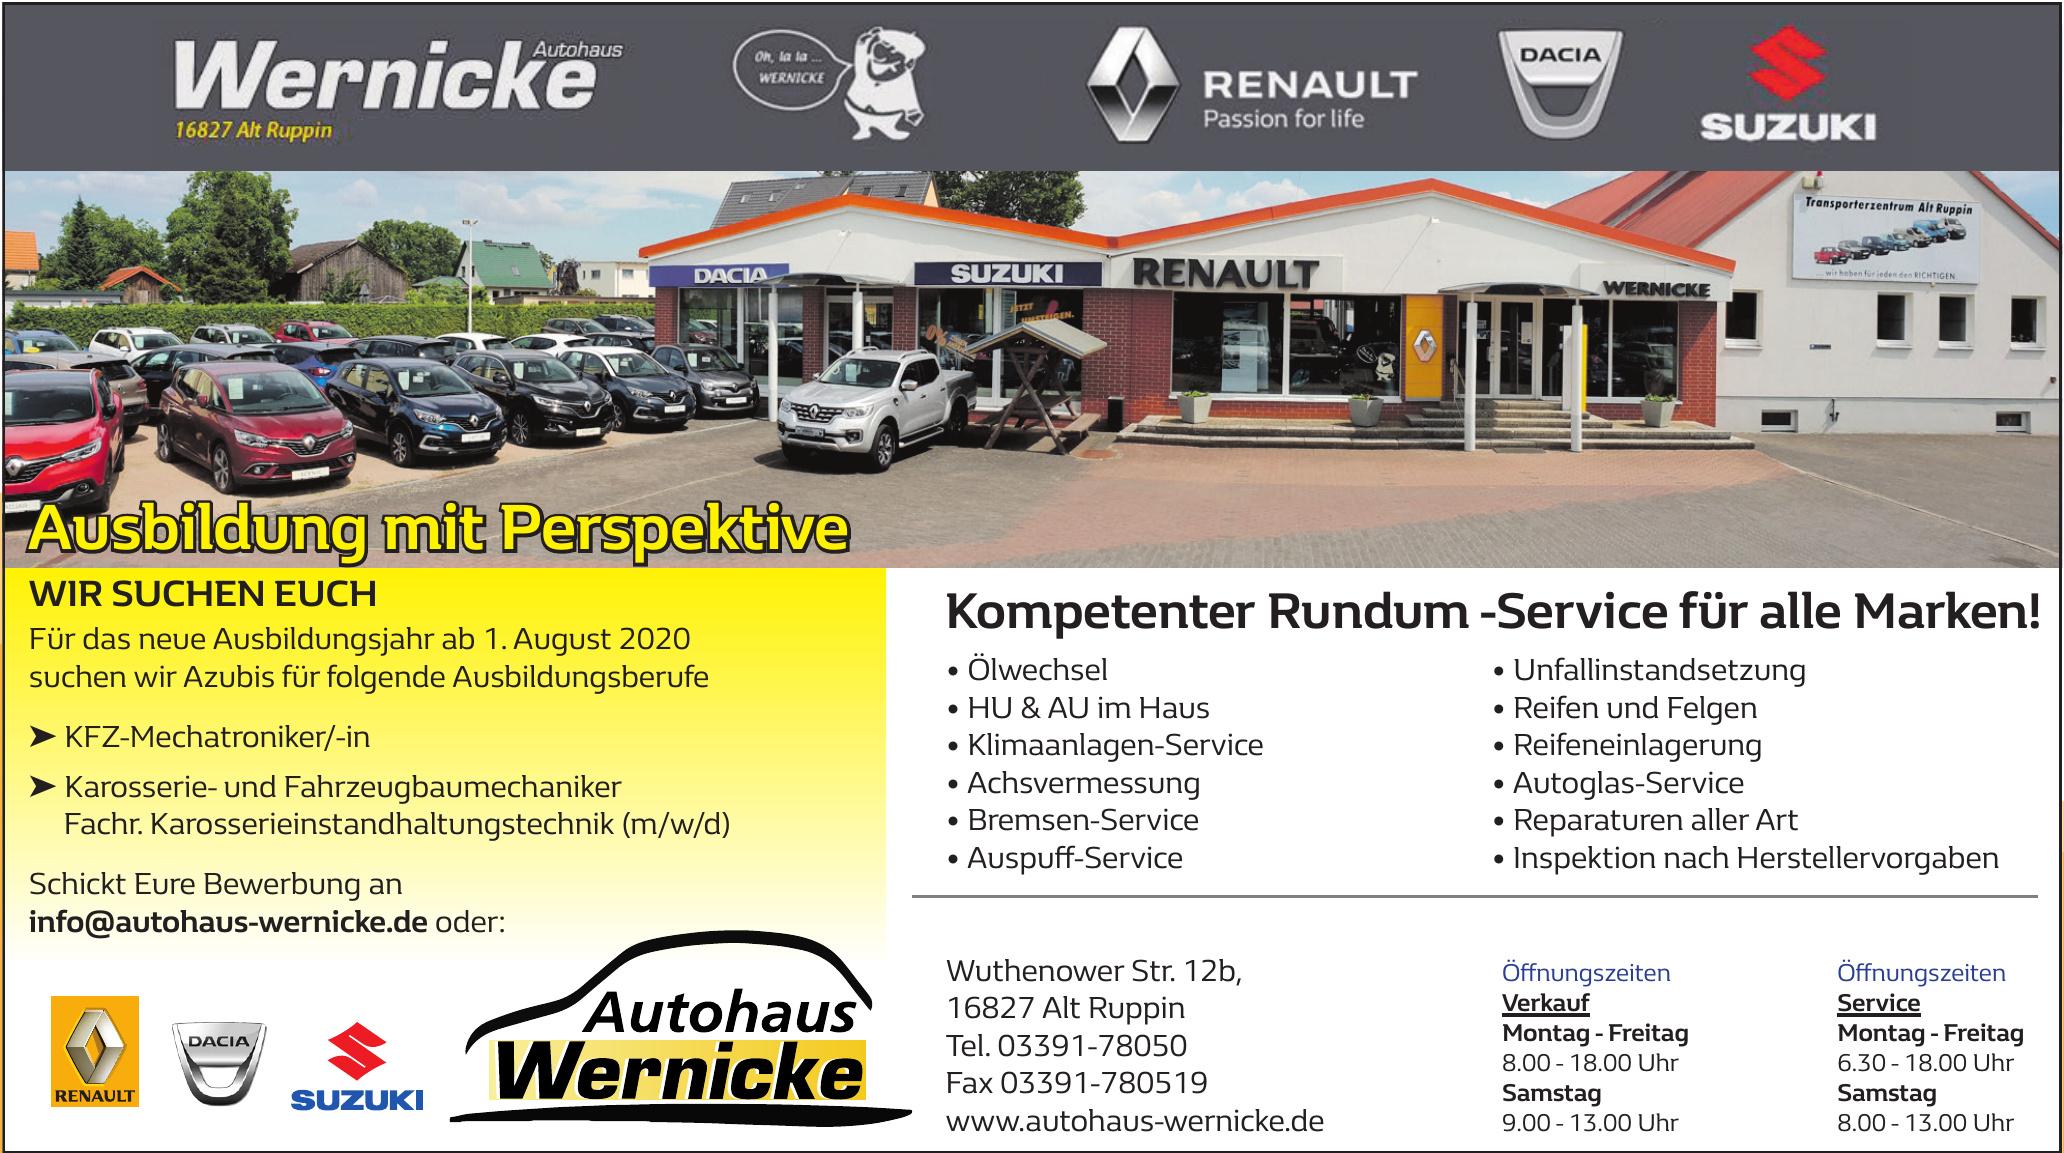 Autohaus Wernicke GmbH